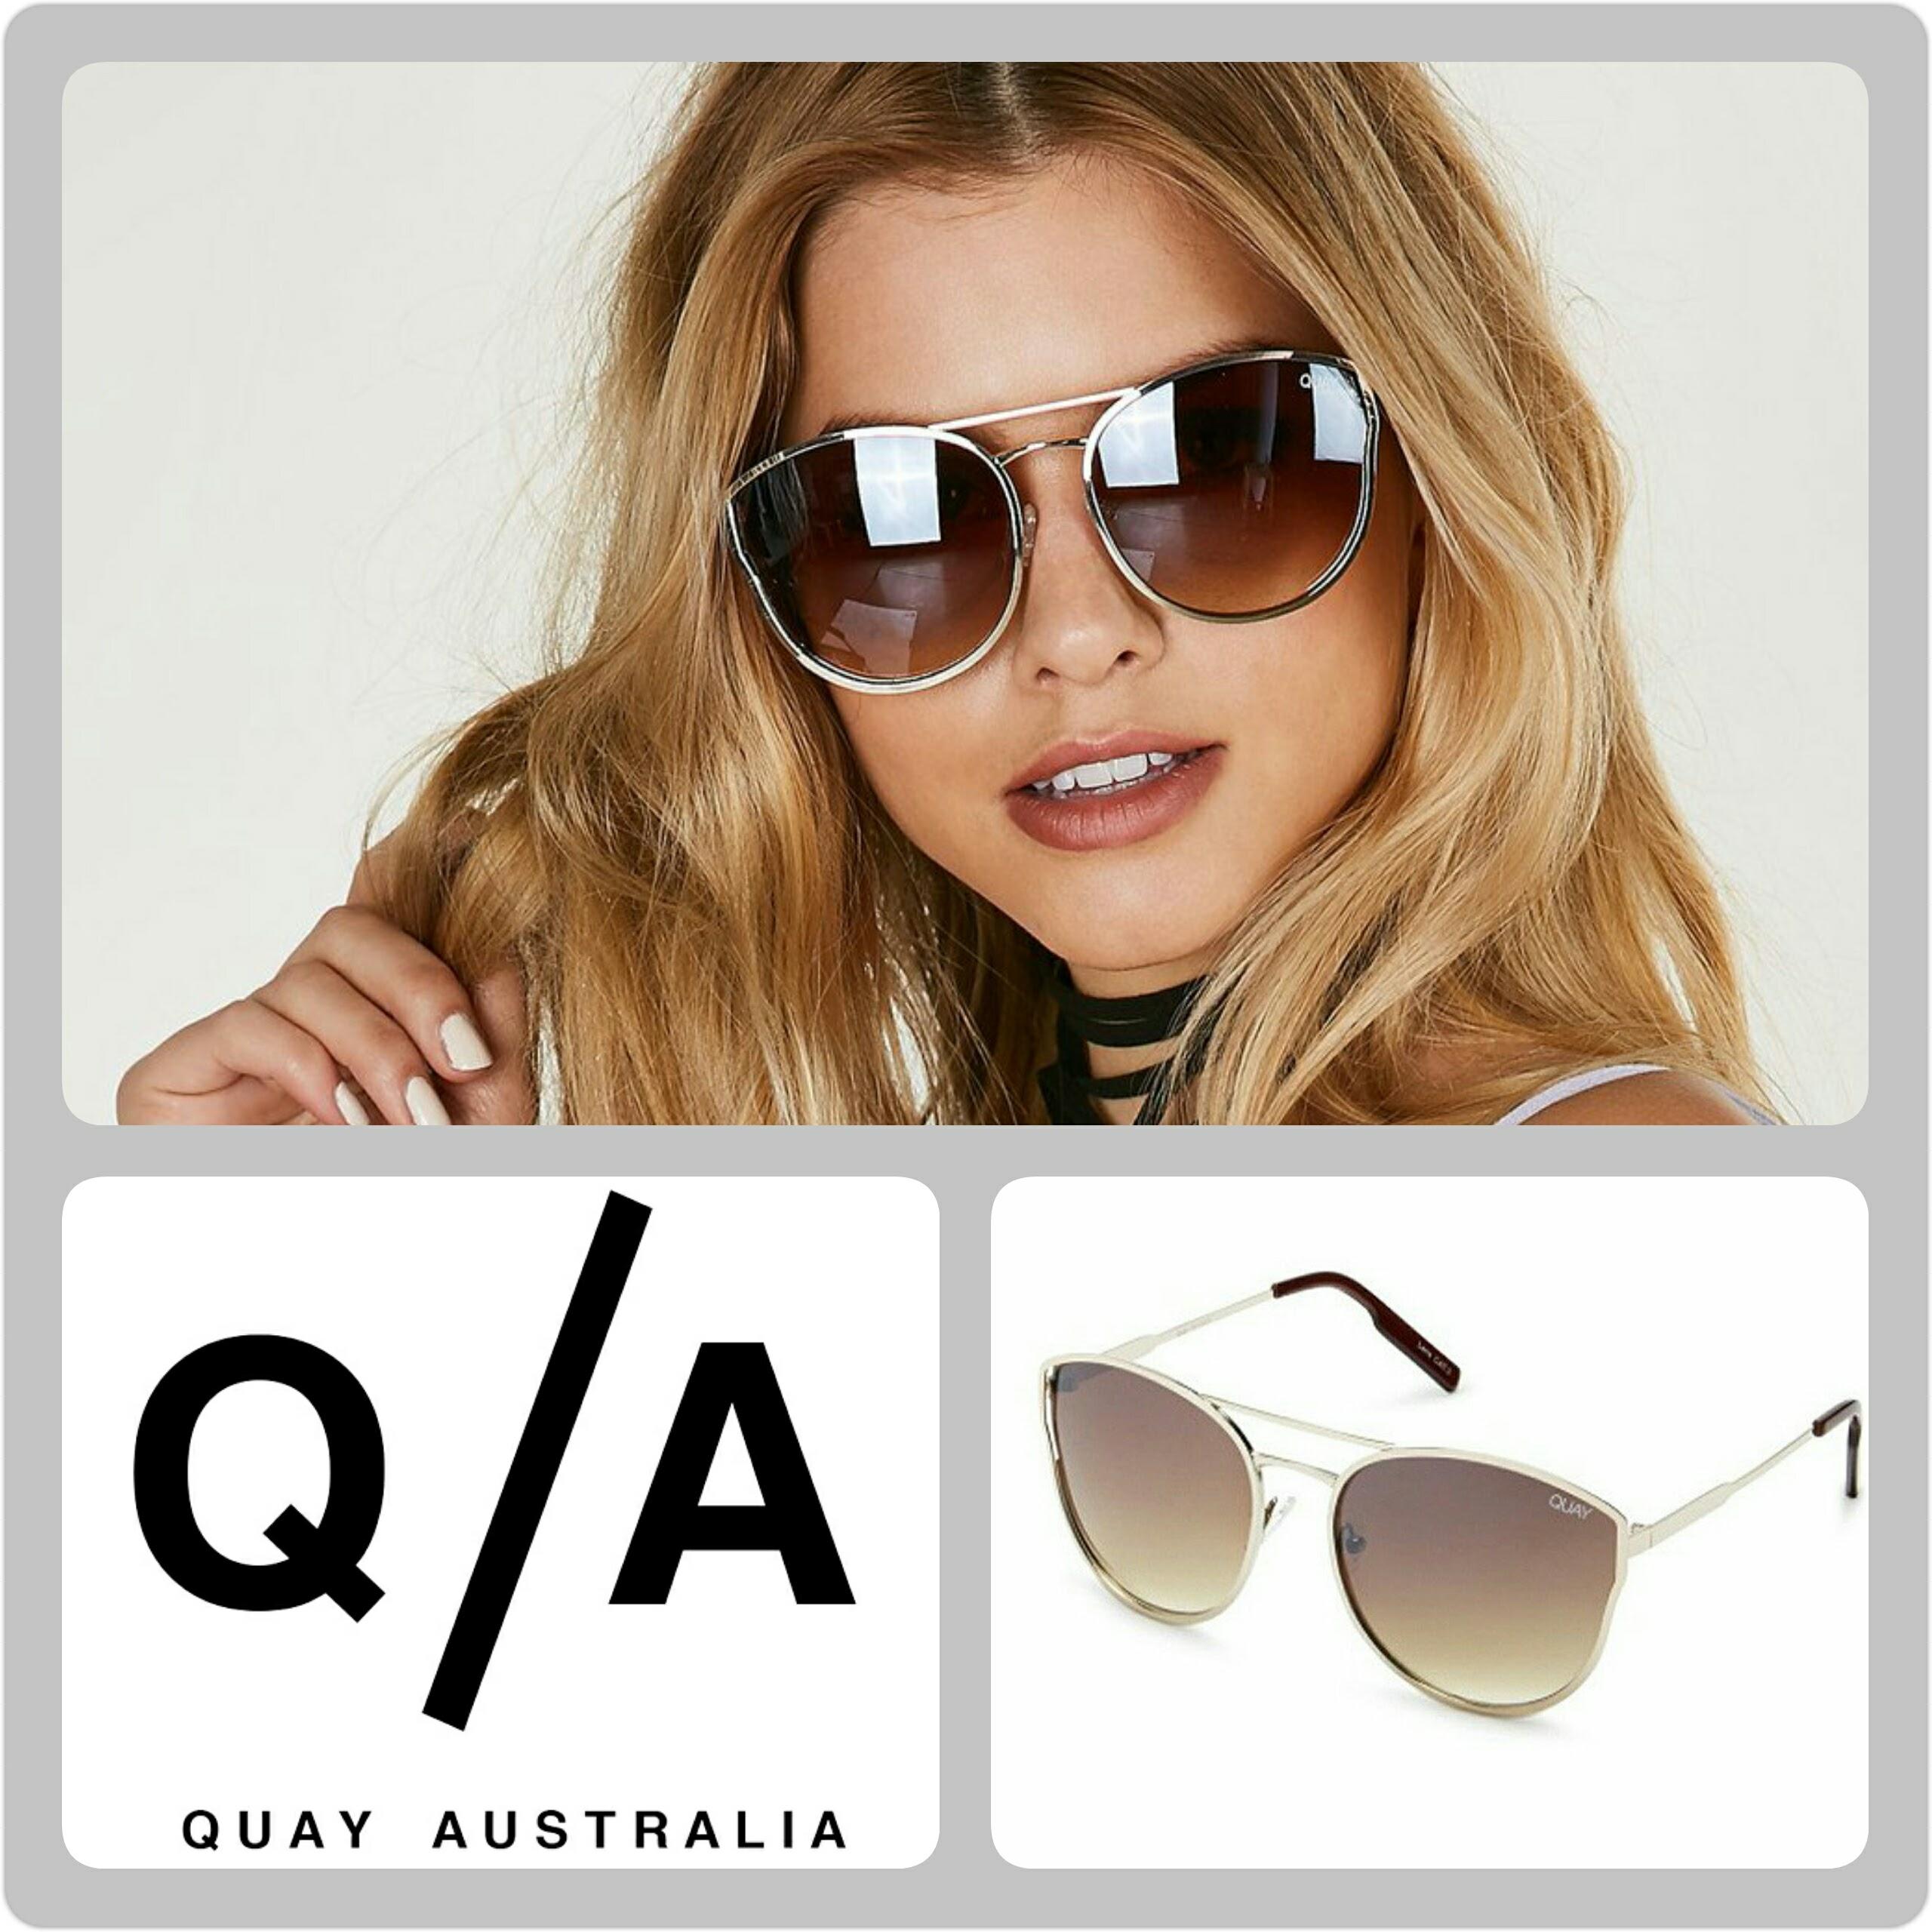 92a39e7fc3 Quay Australia